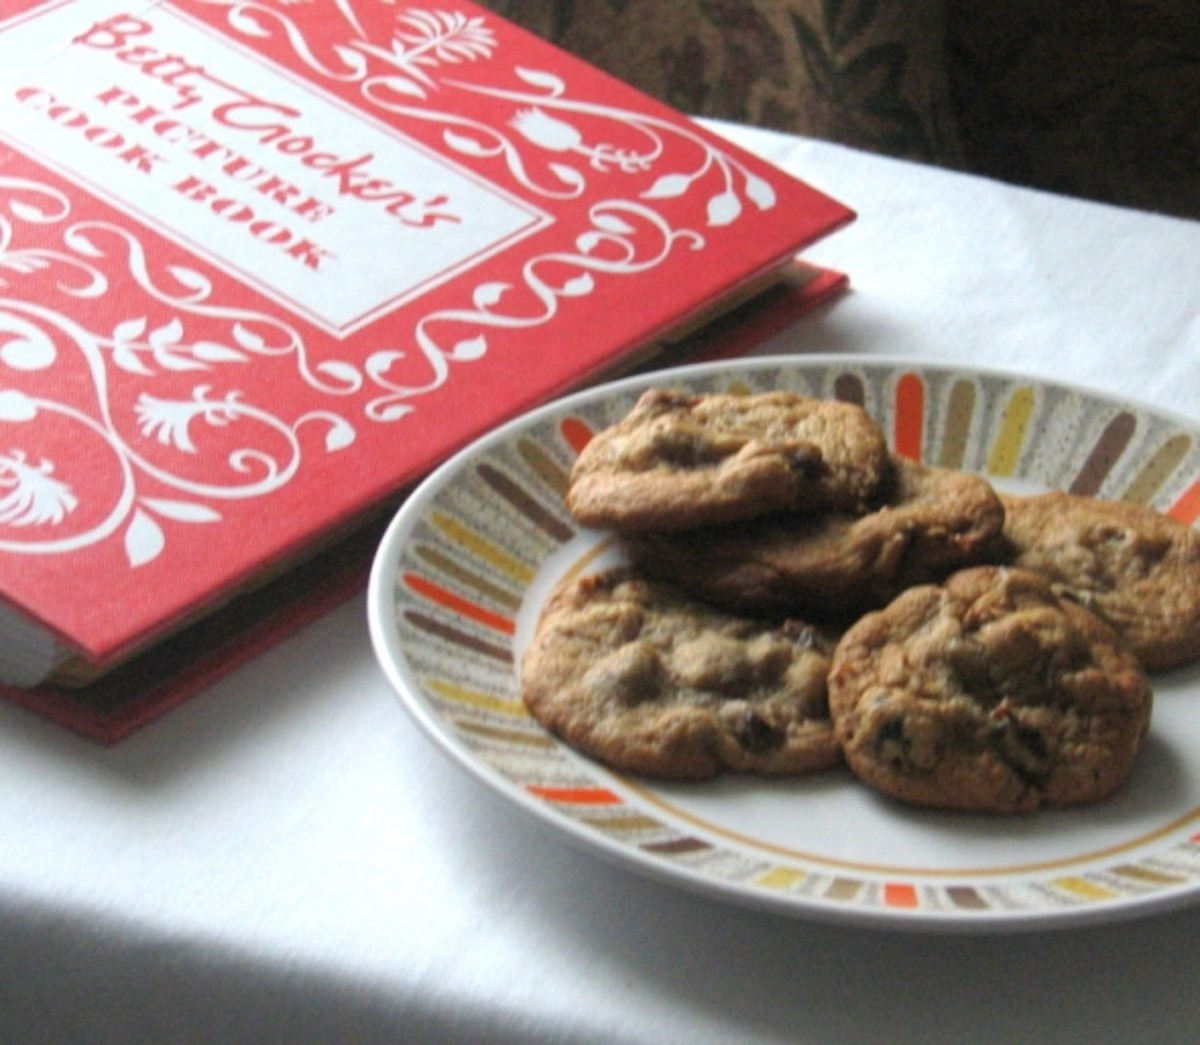 Hermits and Betty Crocker cookbook